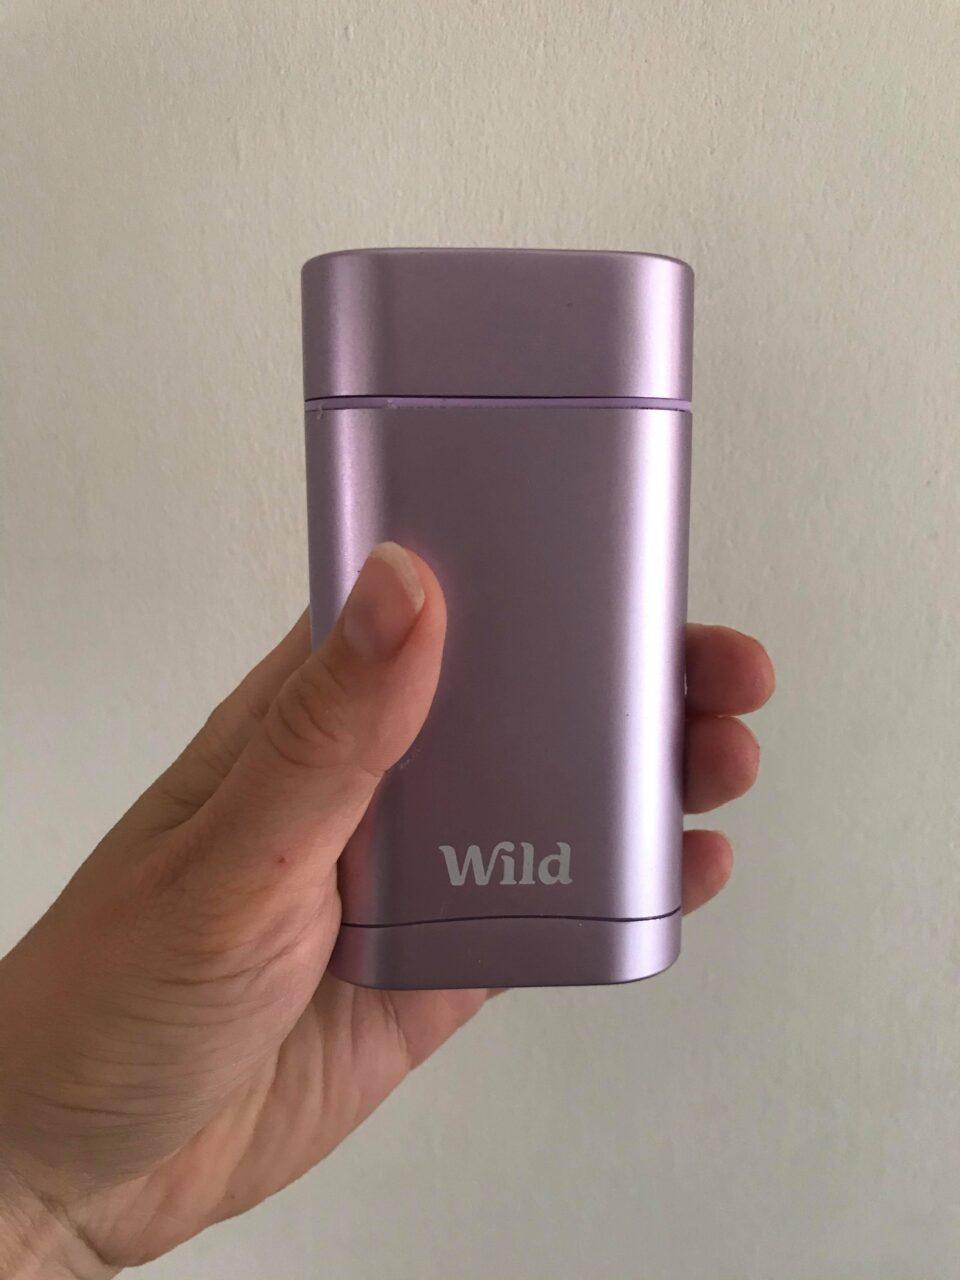 me holding the wild deodorant applicator up